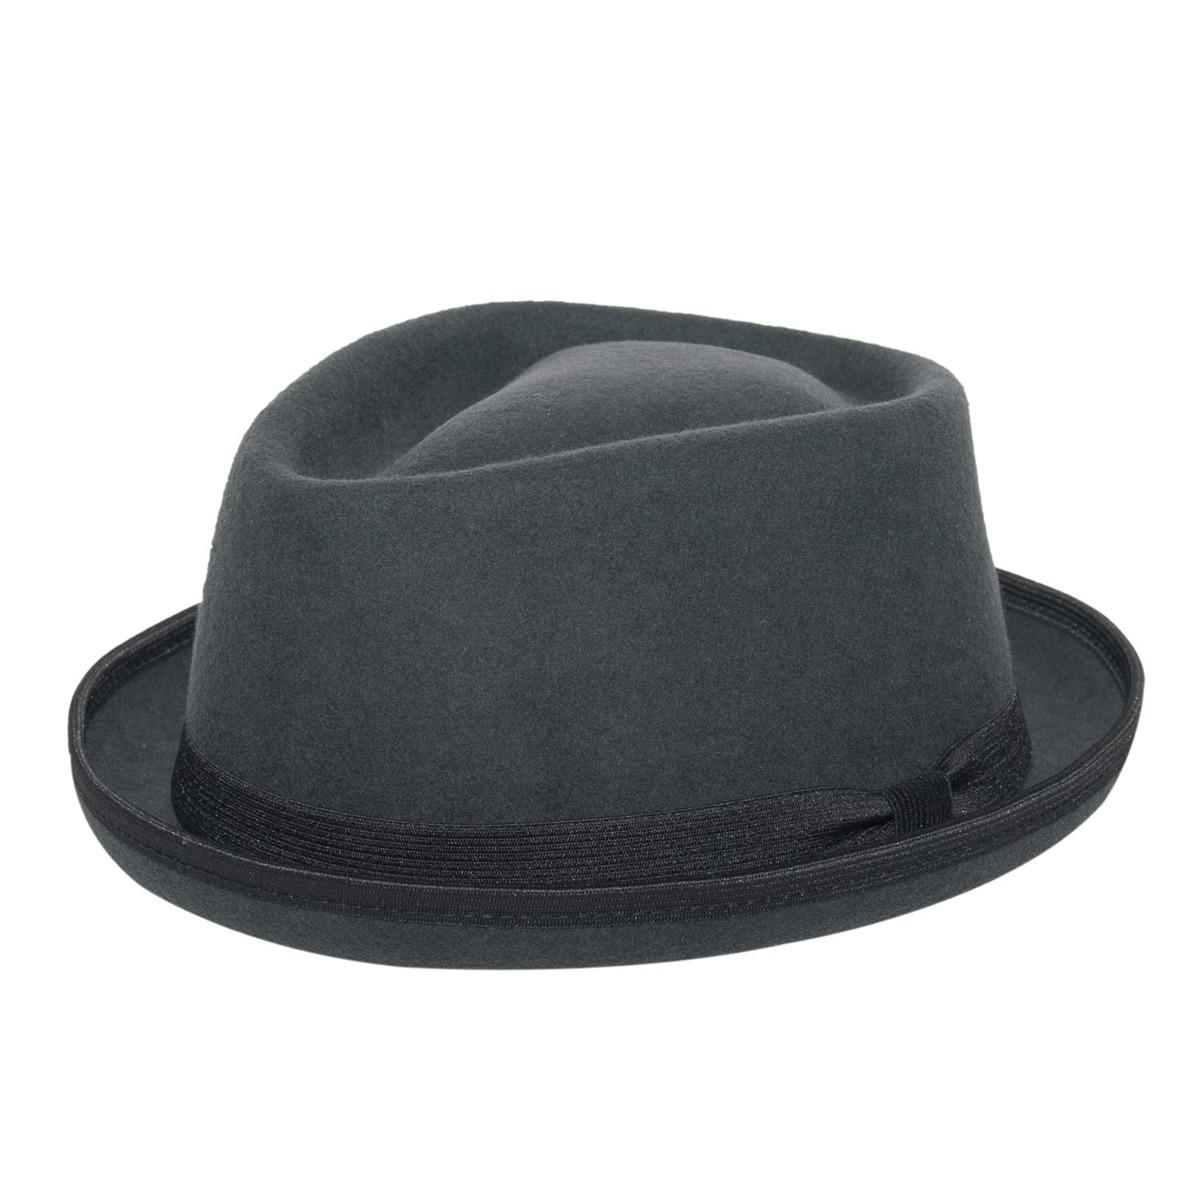 d242cd617f800 chapéu pork pie masculino cinza aba curta feltro. Carregando zoom.